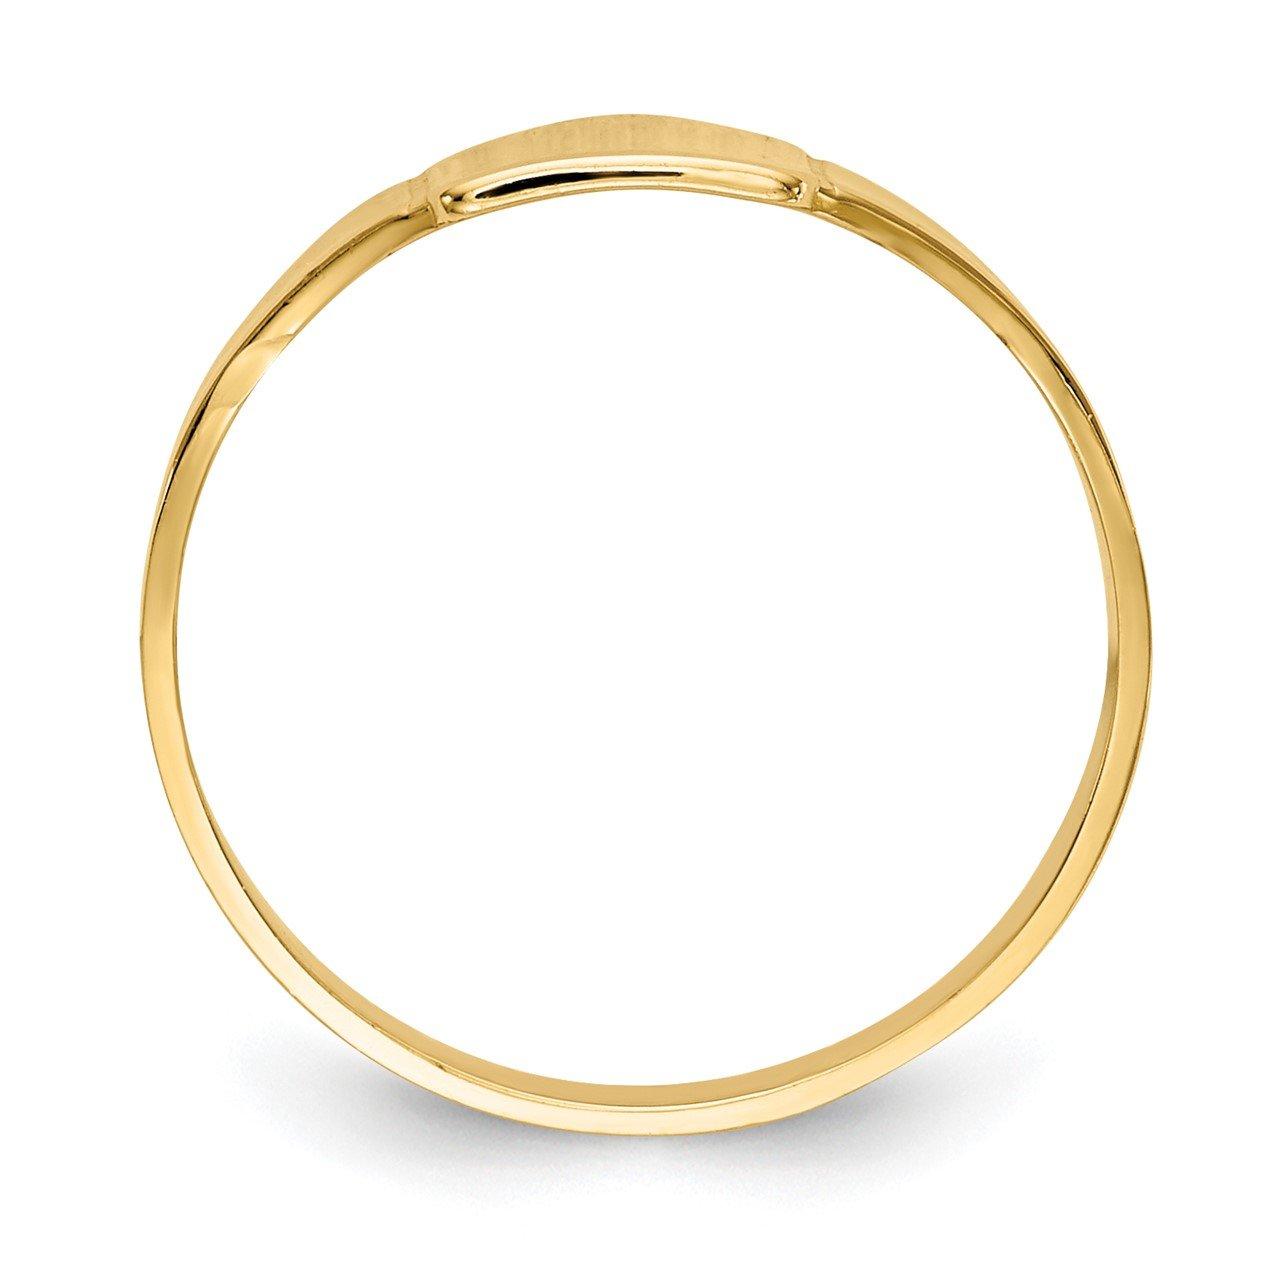 14k Polished Square Signet Baby Ring-1